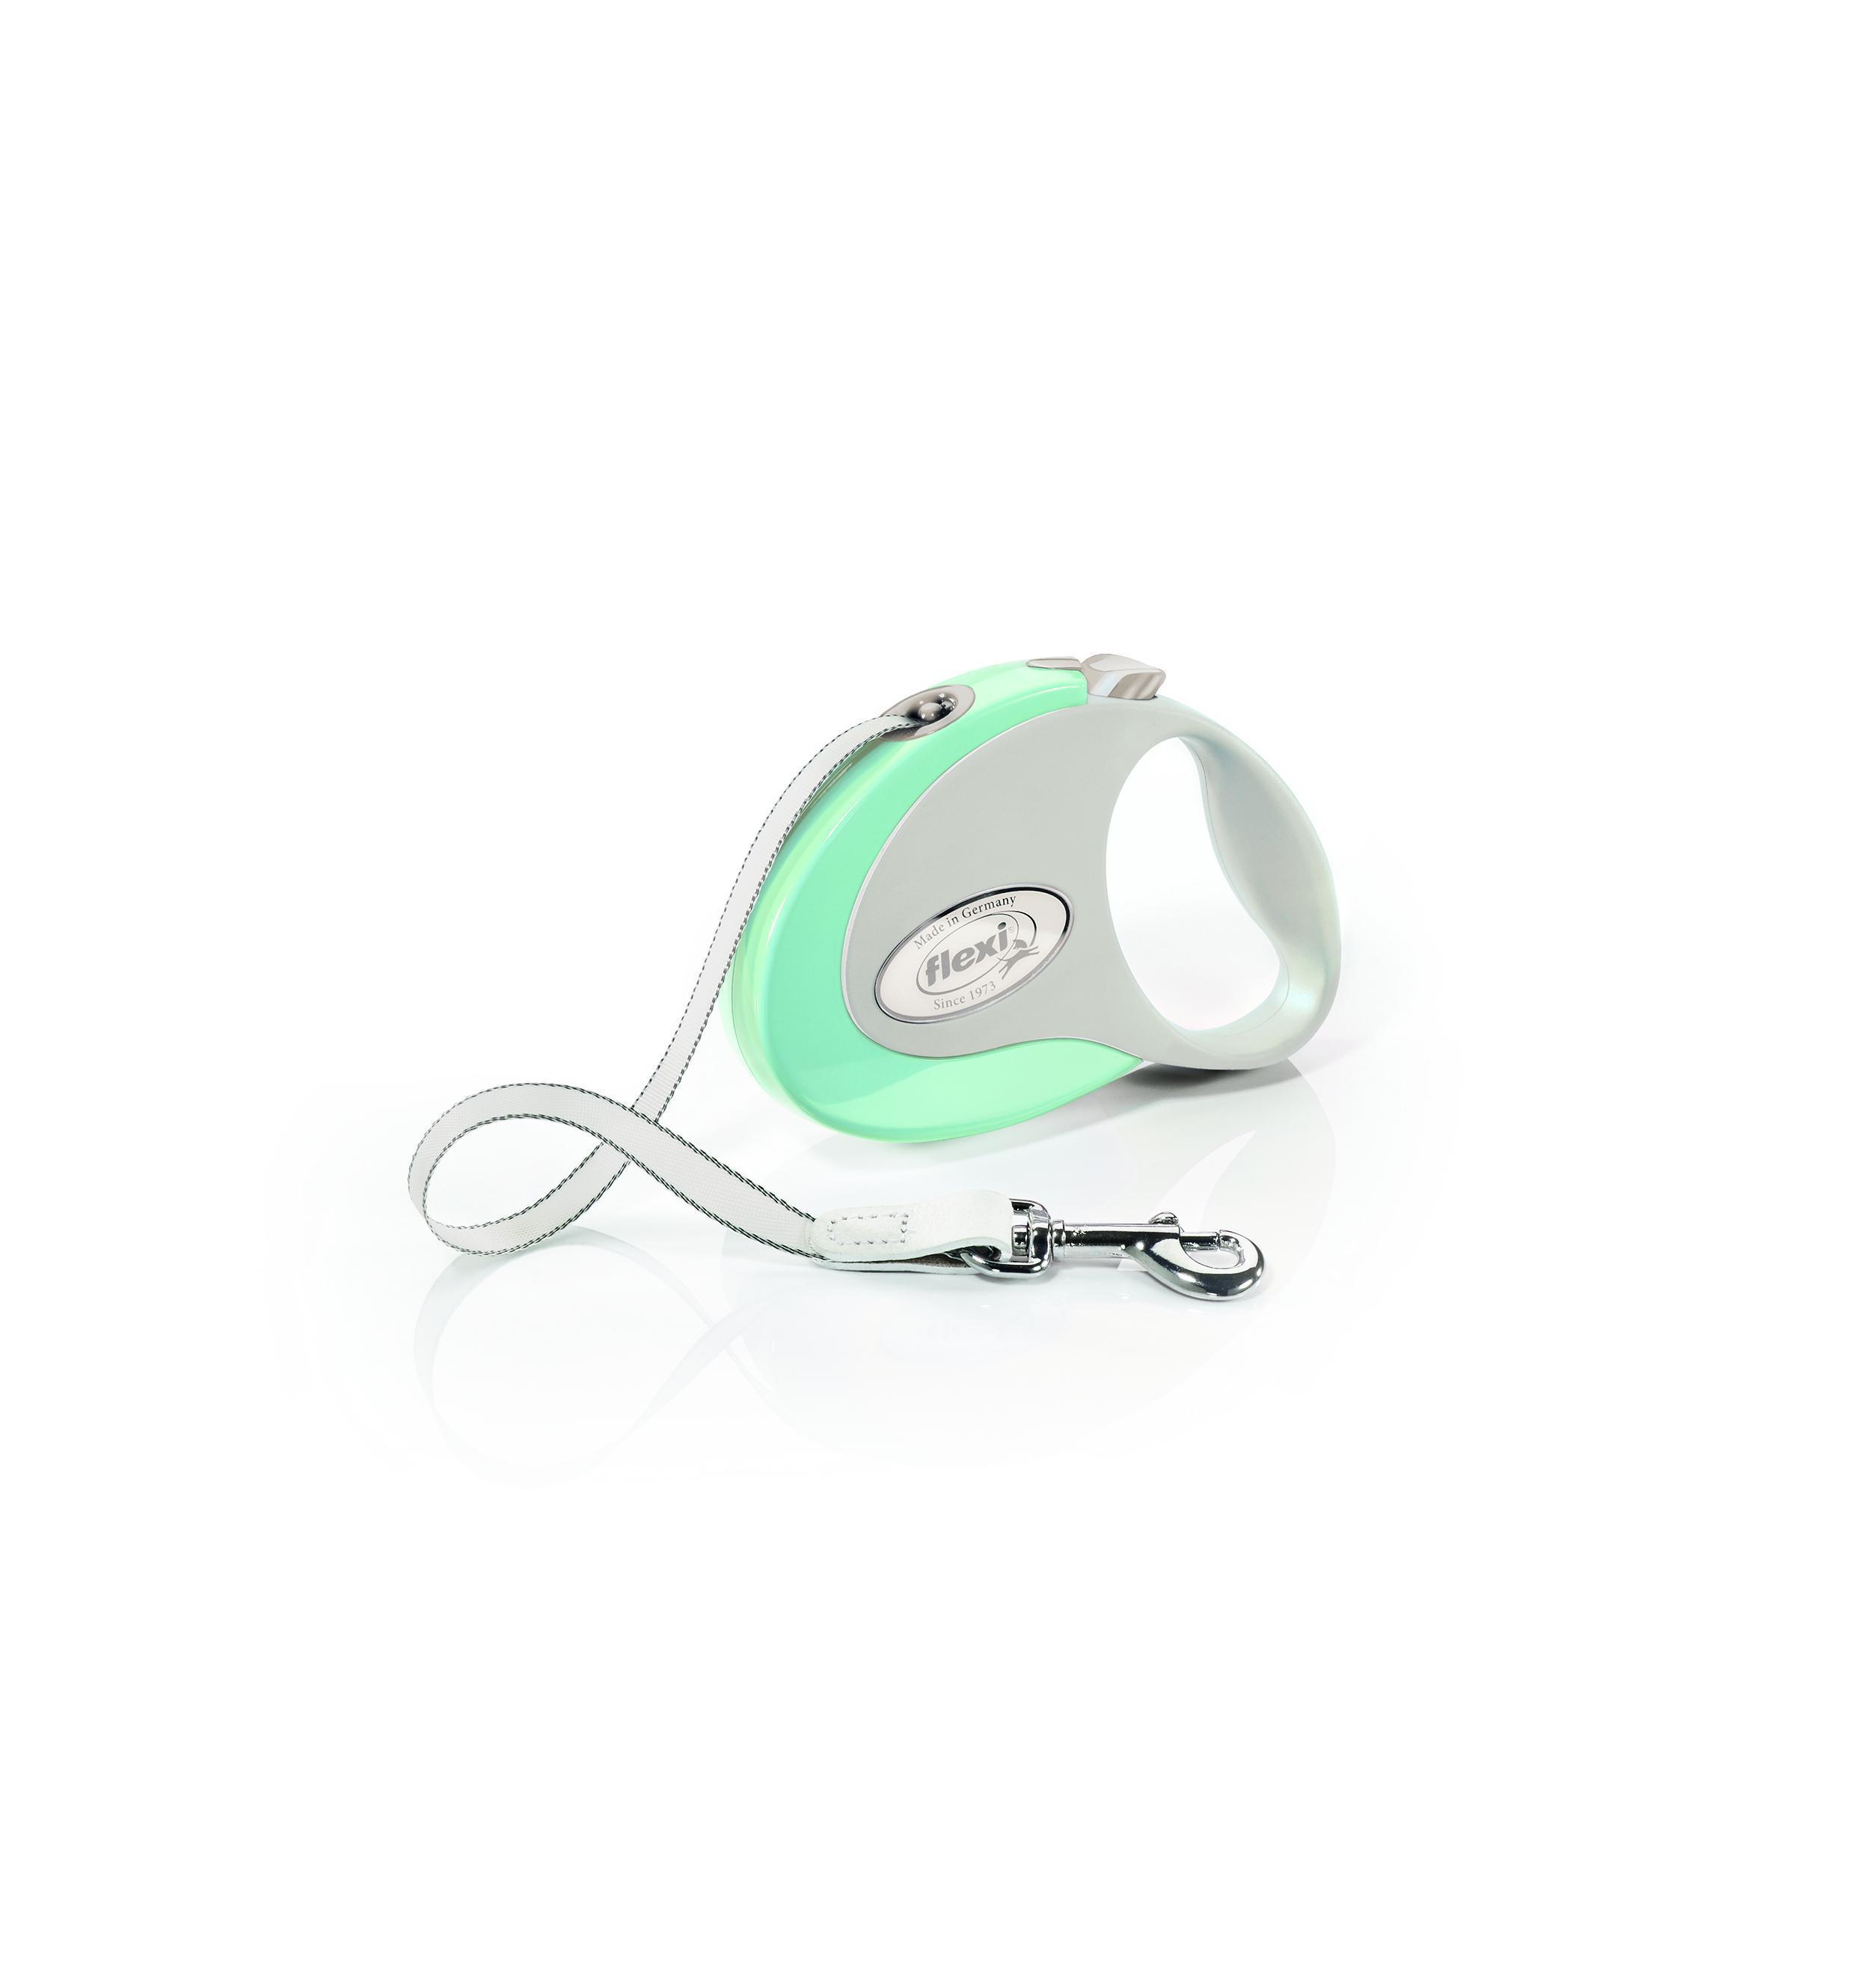 Flexi New Style Tape Dog Leash, Mint/Gray, Medium, 10-ft